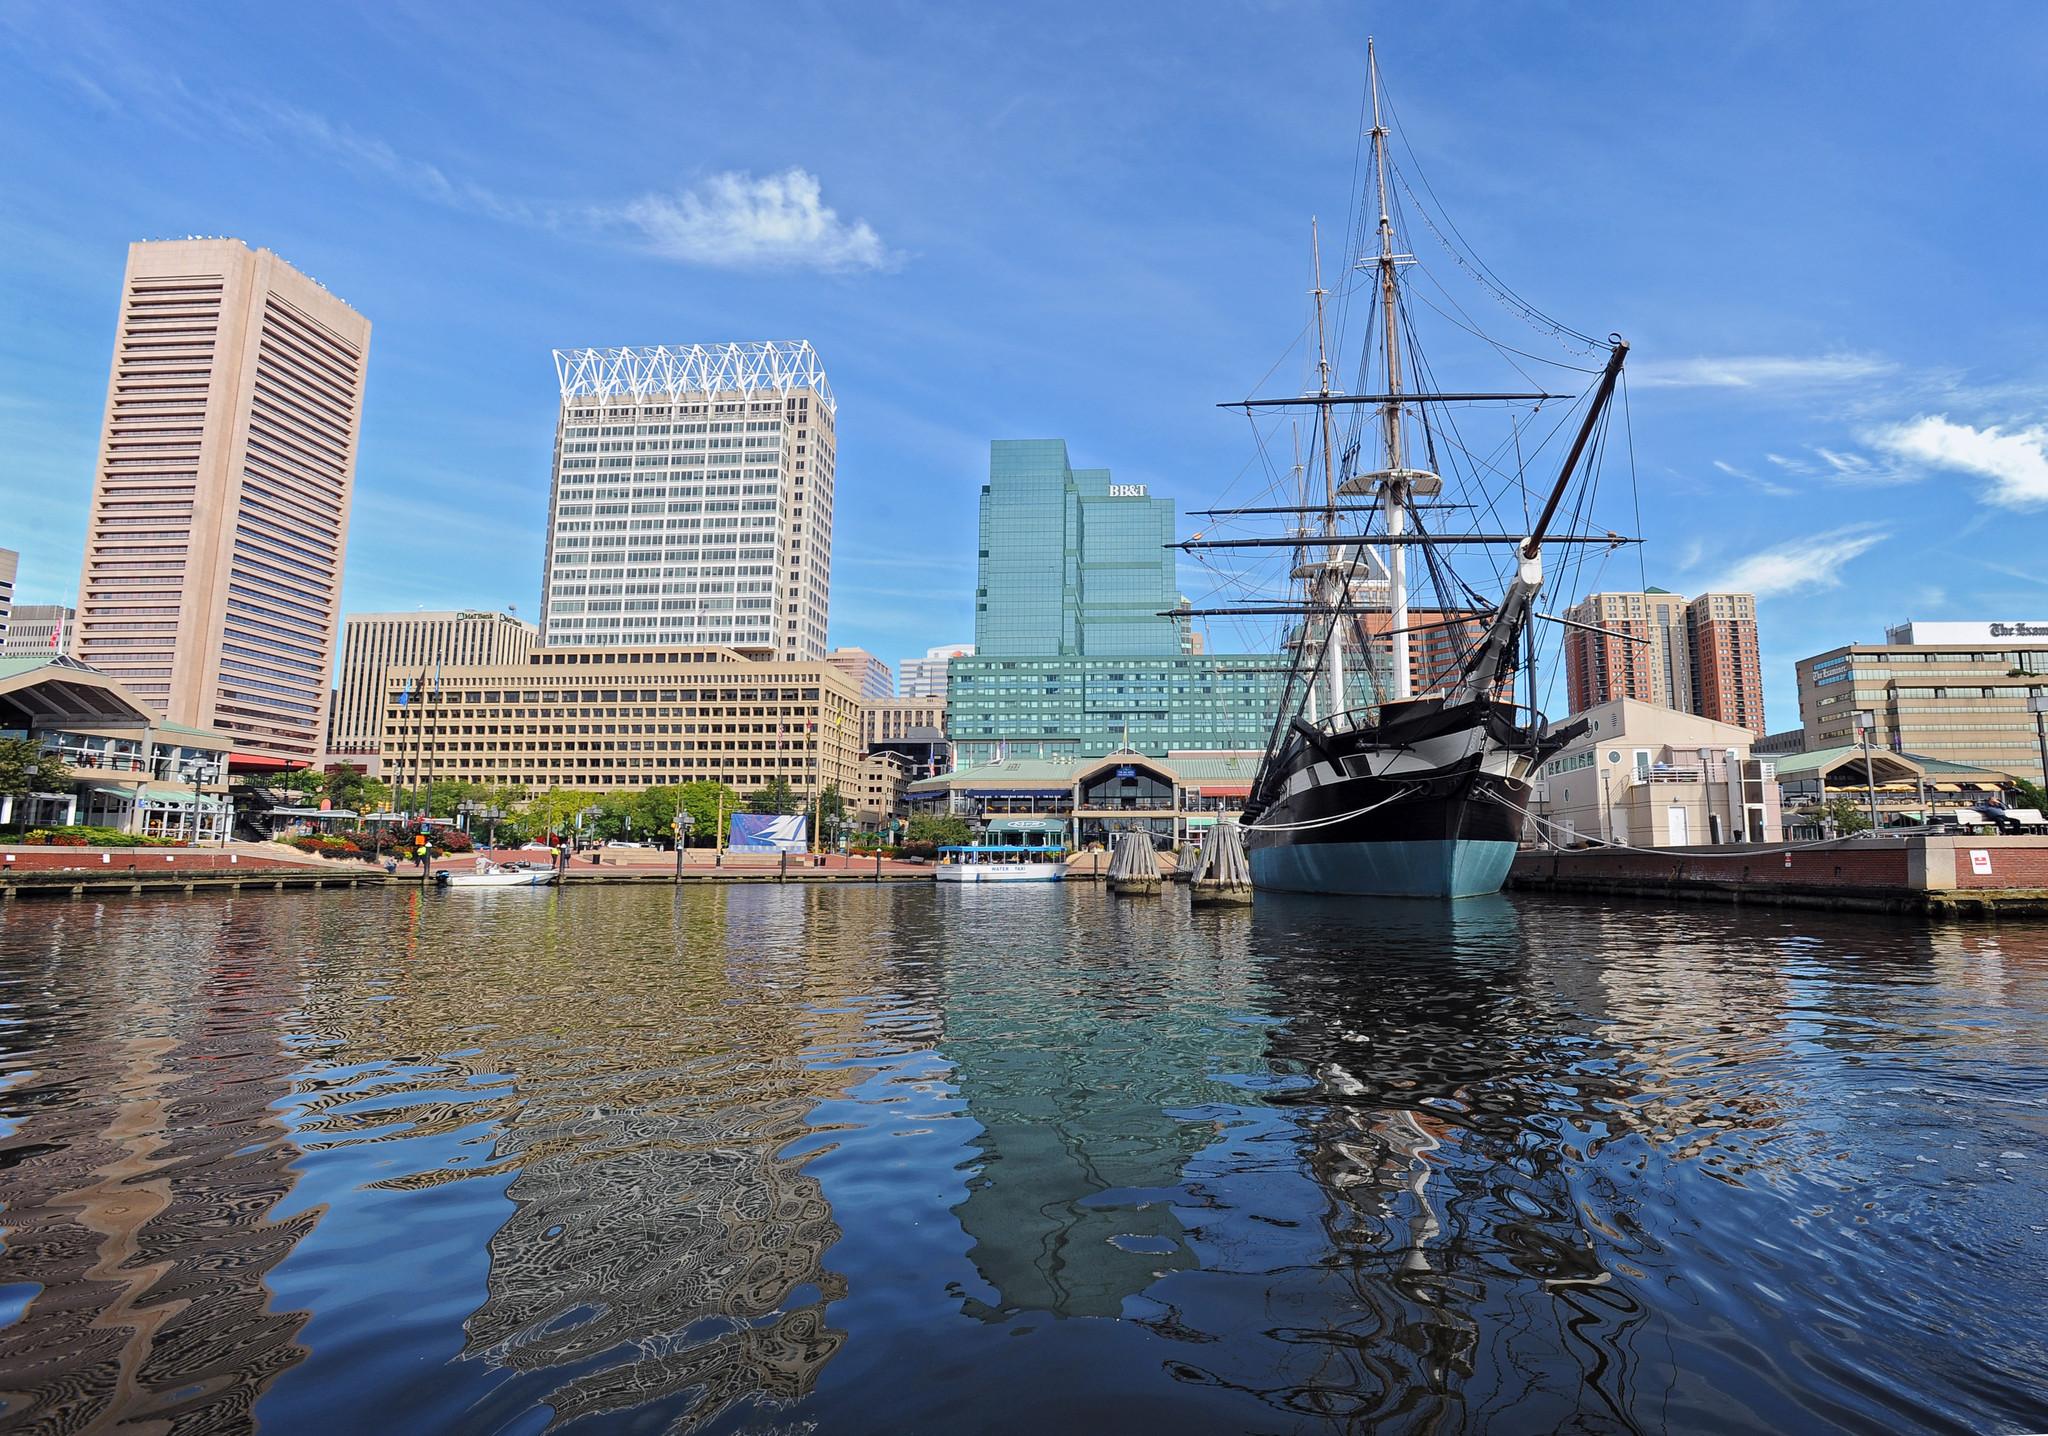 Baltimore inner harbor photo